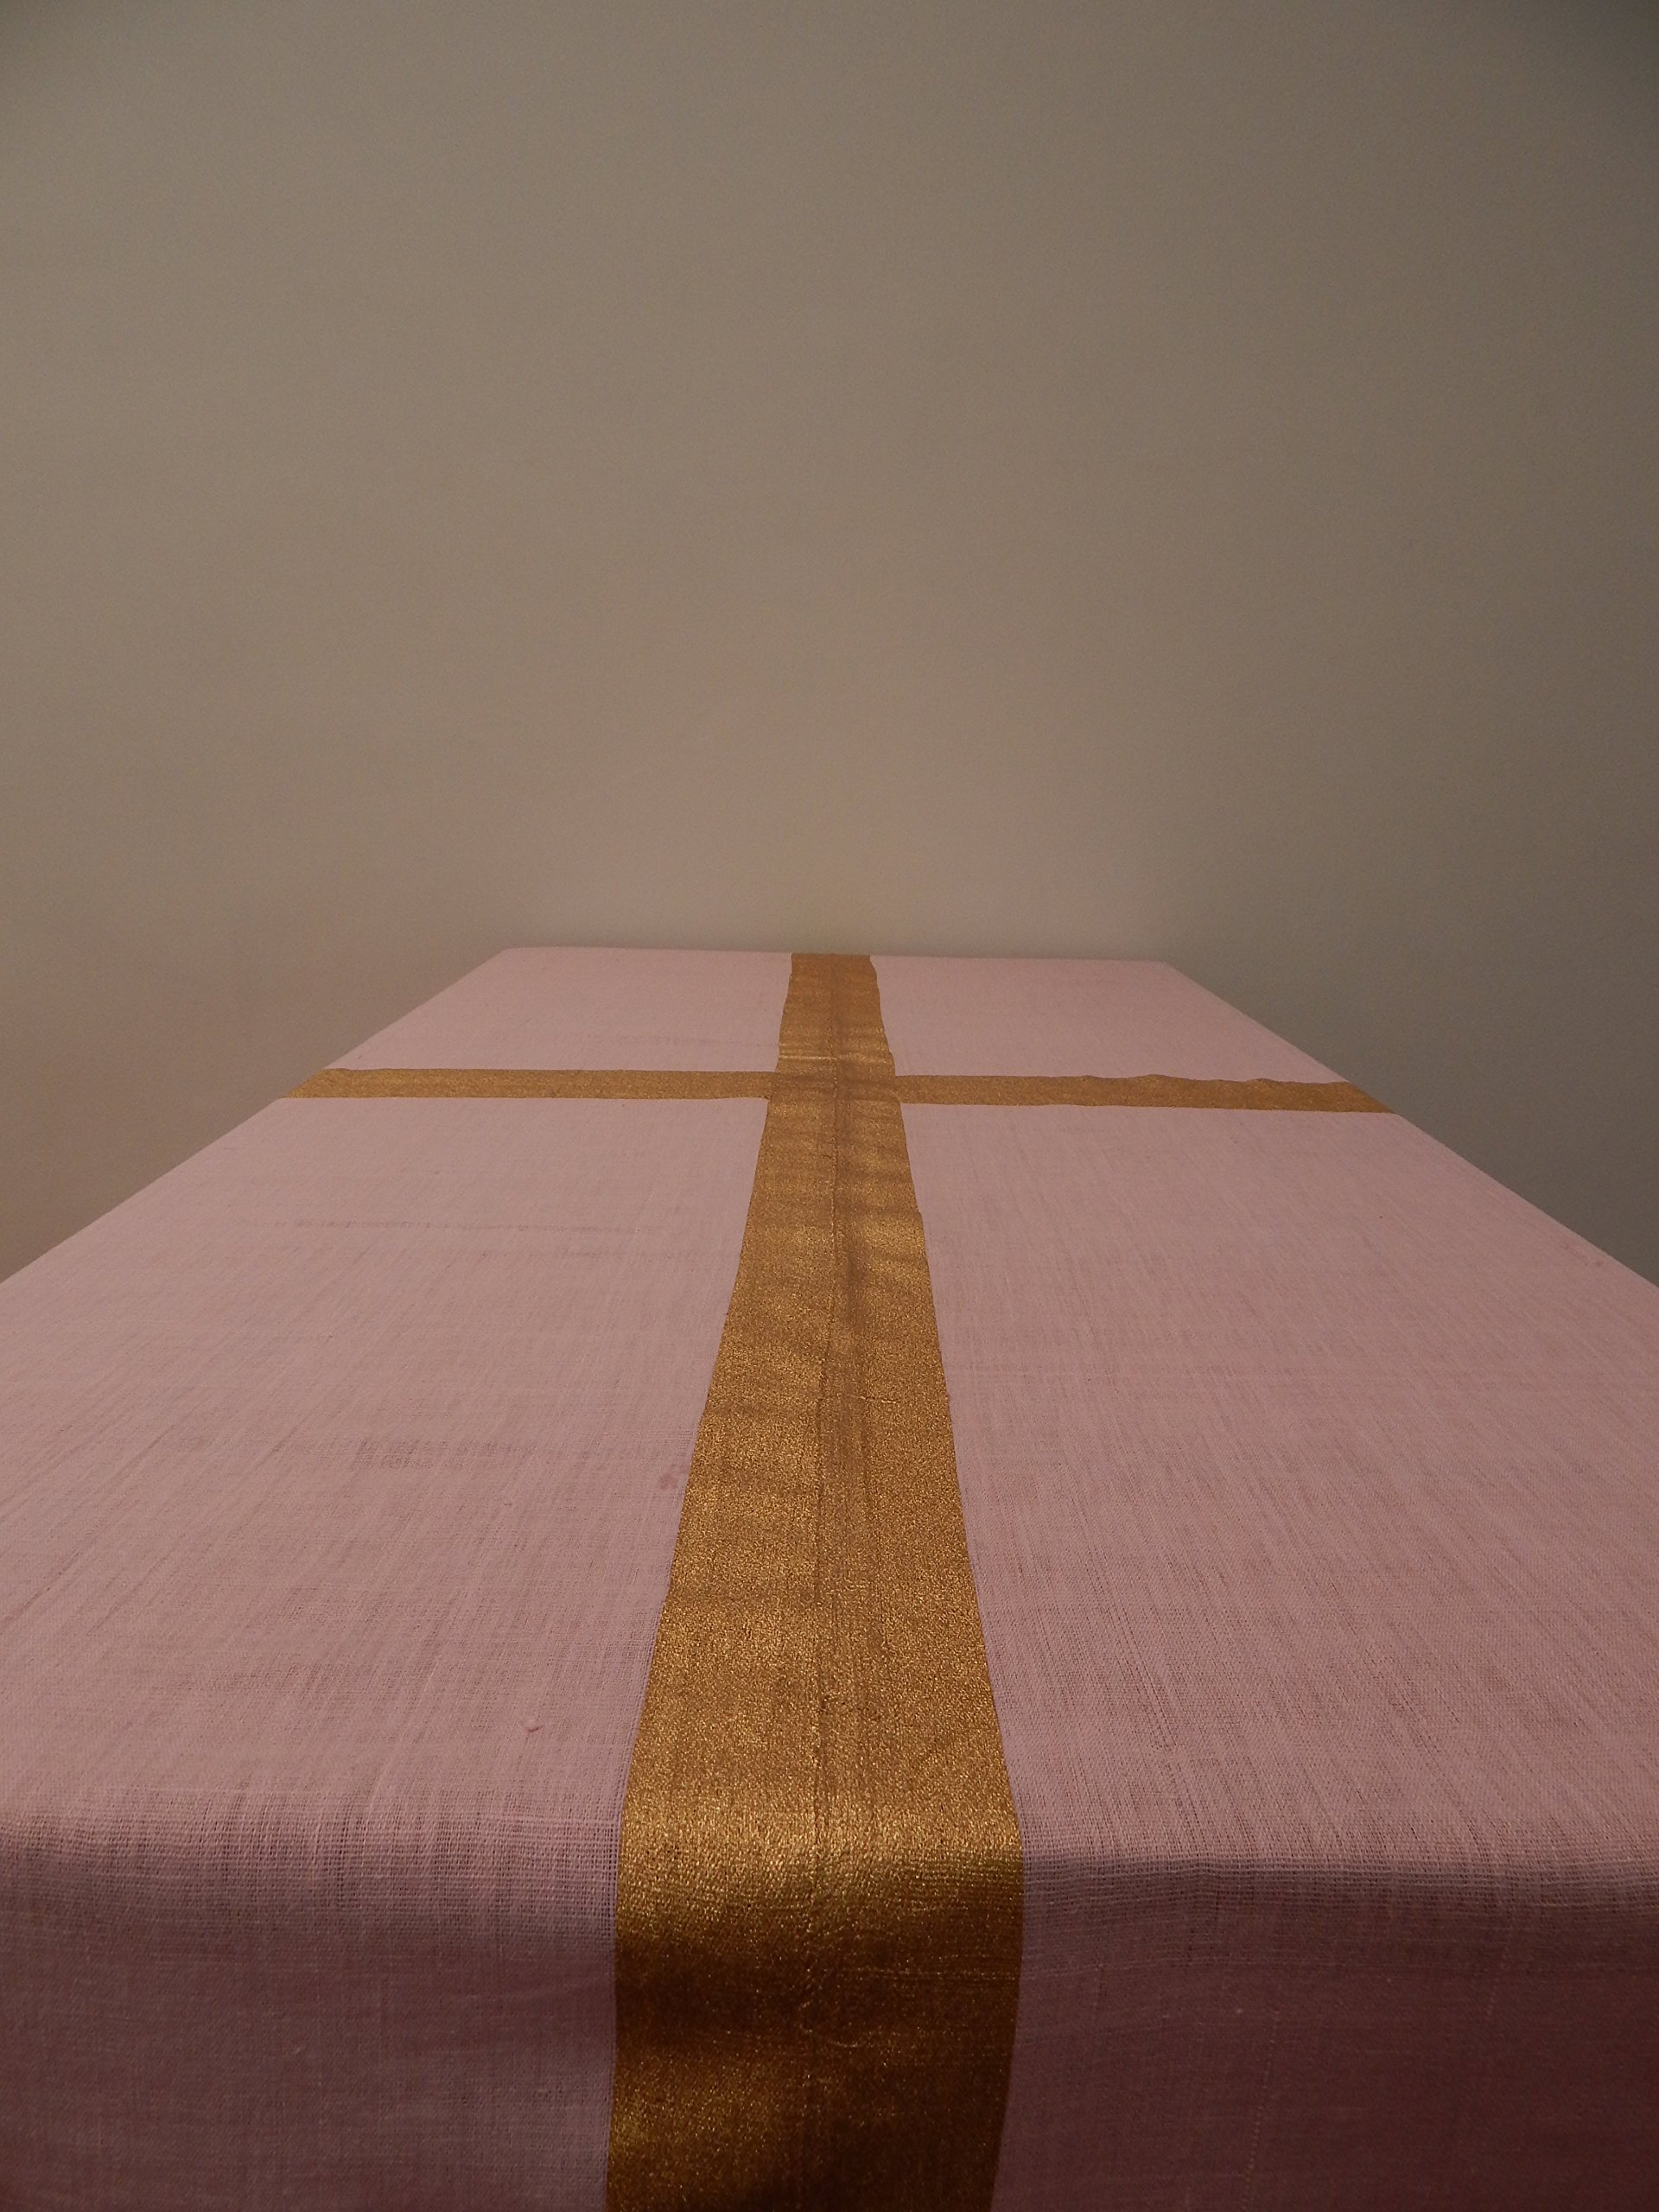 Gitika Goyal Home Cotton Khadi Gold Screen Printed Tablecloth with Border Design, Pink, 60'' x 90''